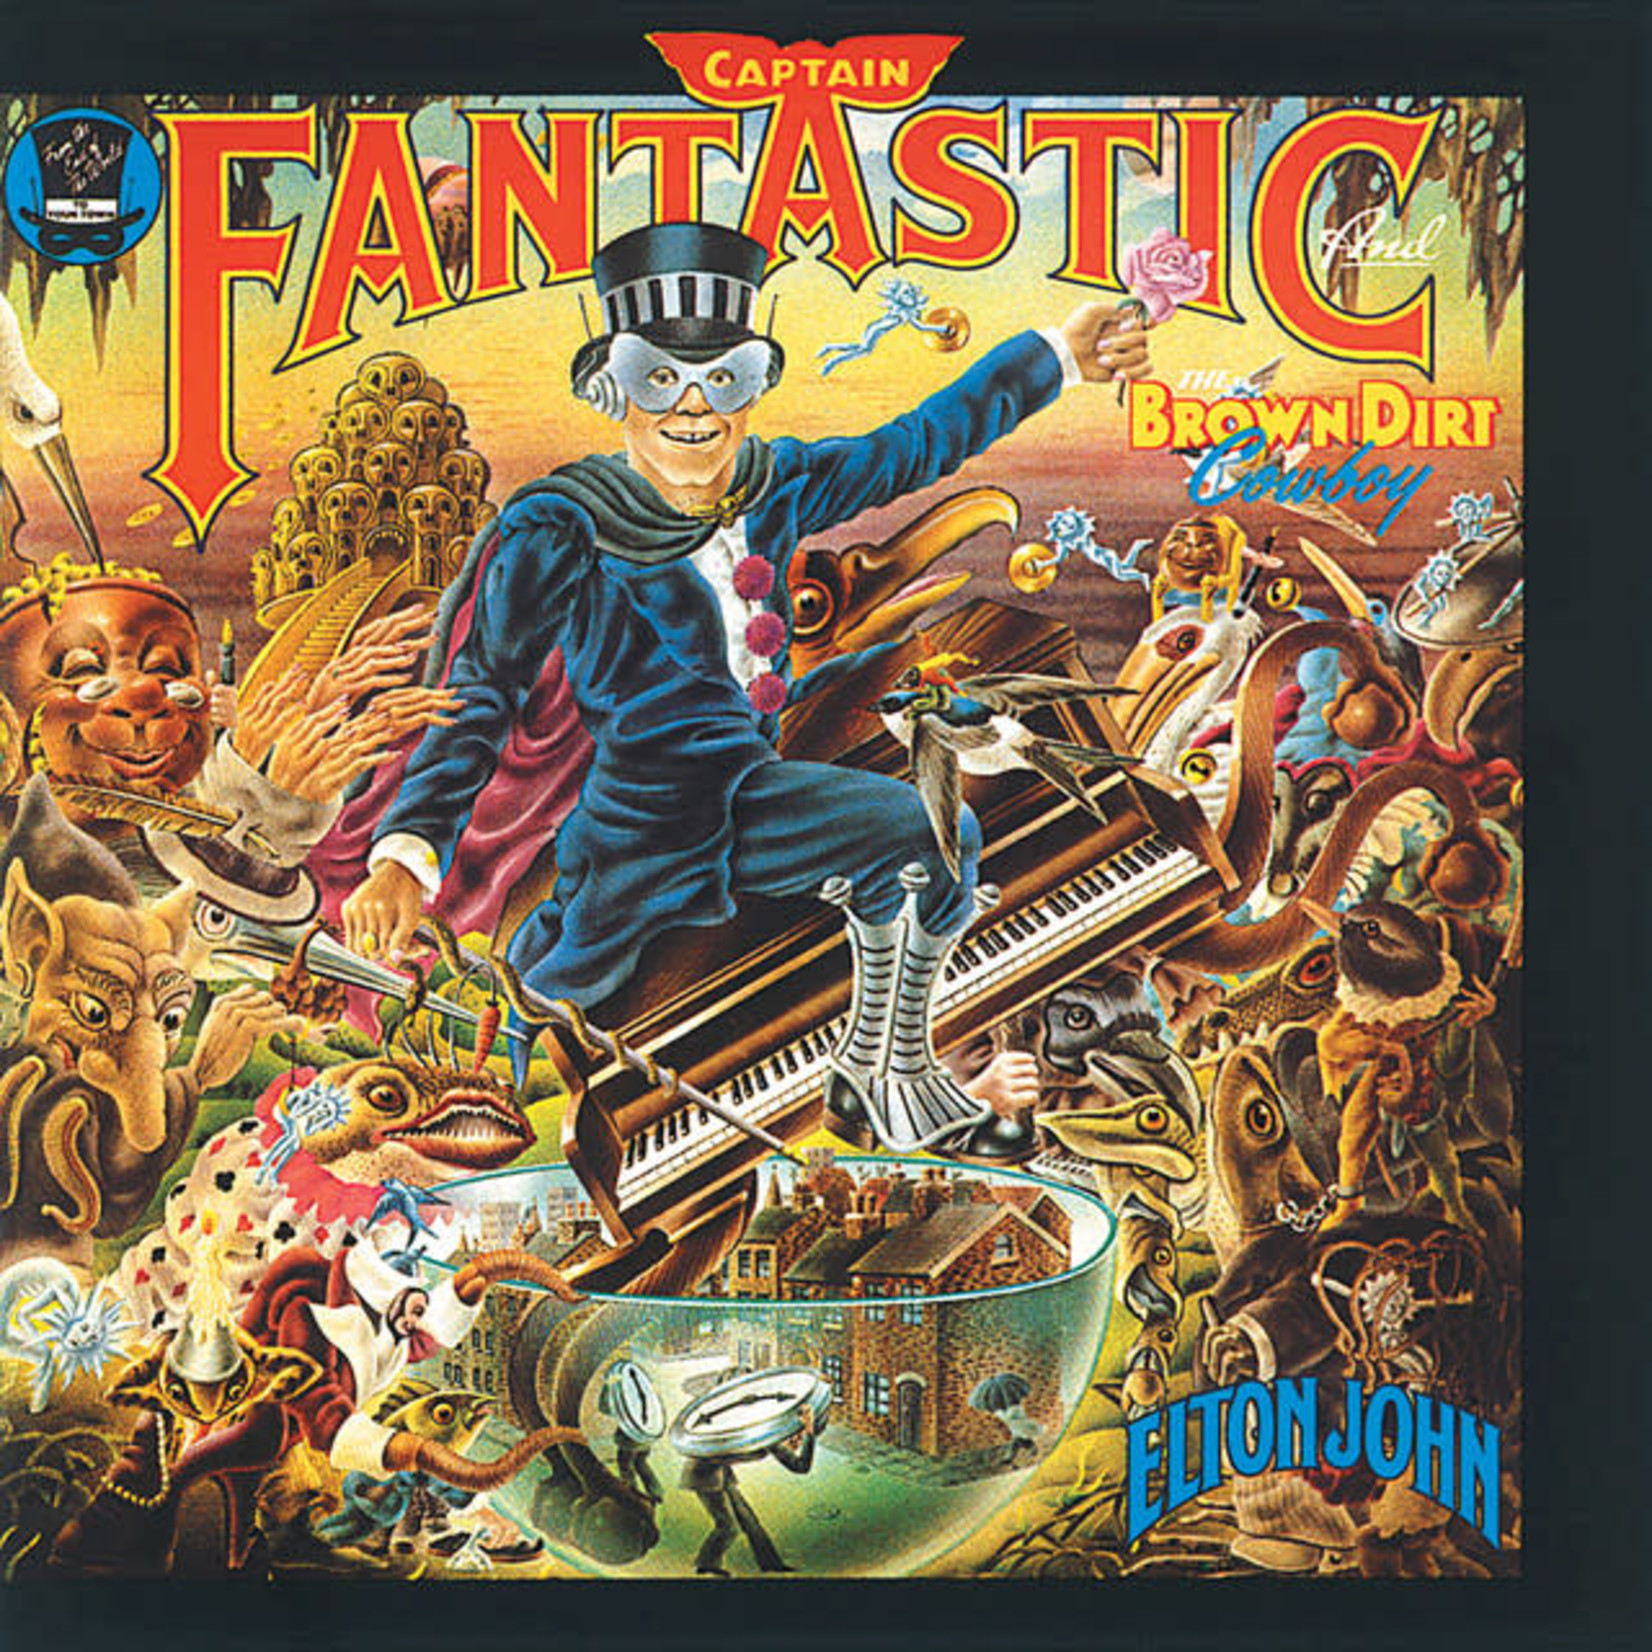 Vinyl Elton John - Captain Fantasic And The Brown Dirt Cowboy